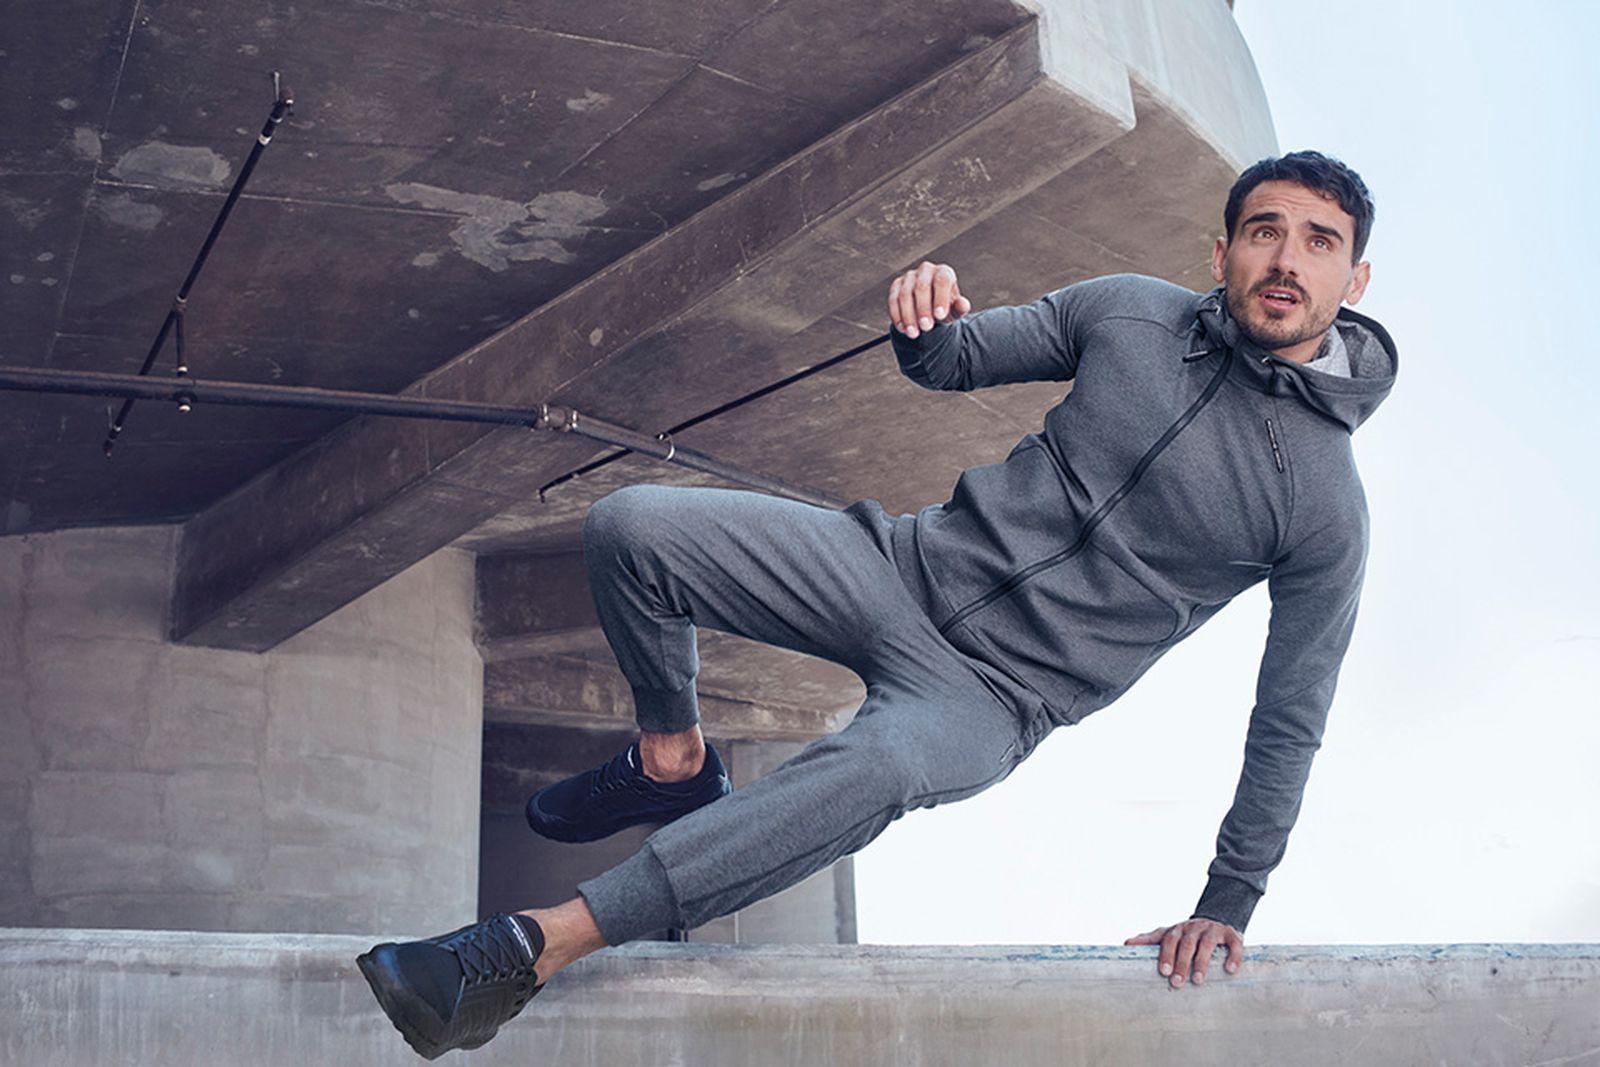 porsche-design-sport-adidas-ultra-boost-black-01